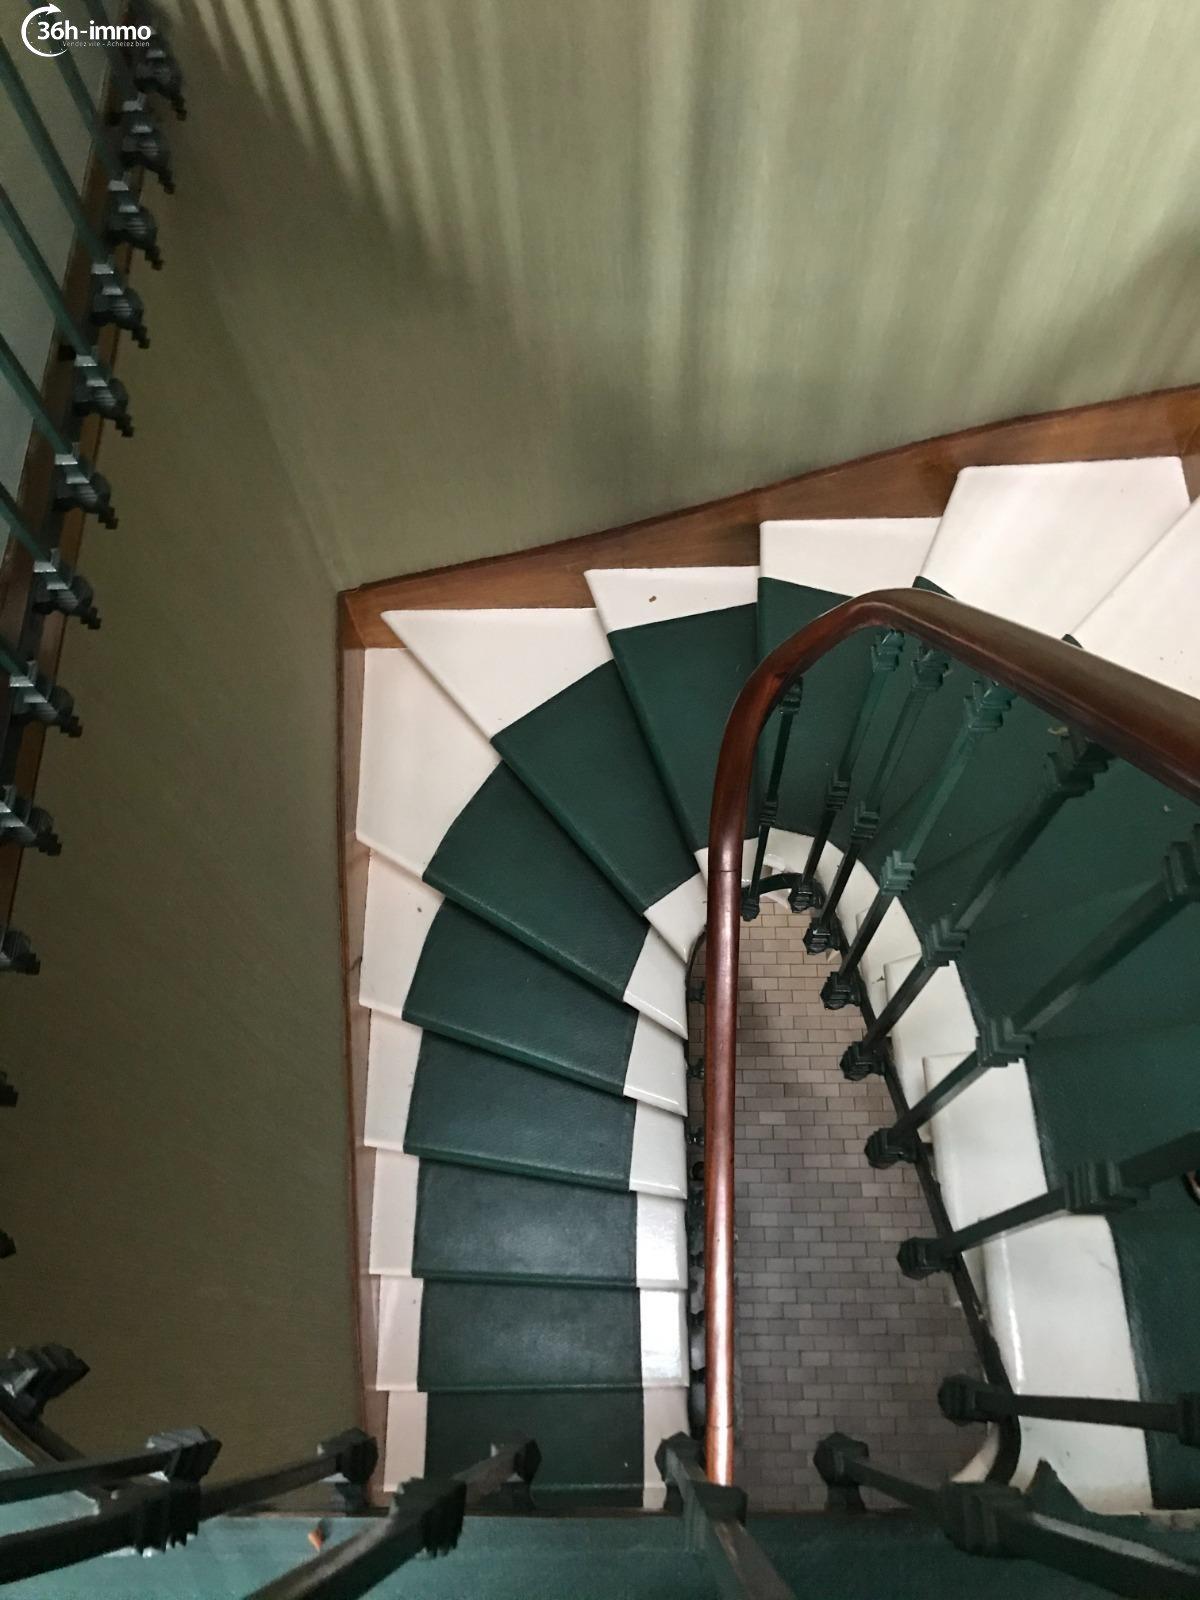 Maison Talence 33400 Gironde 100 m<sup>2</sup> 5 pièces 367500 euros